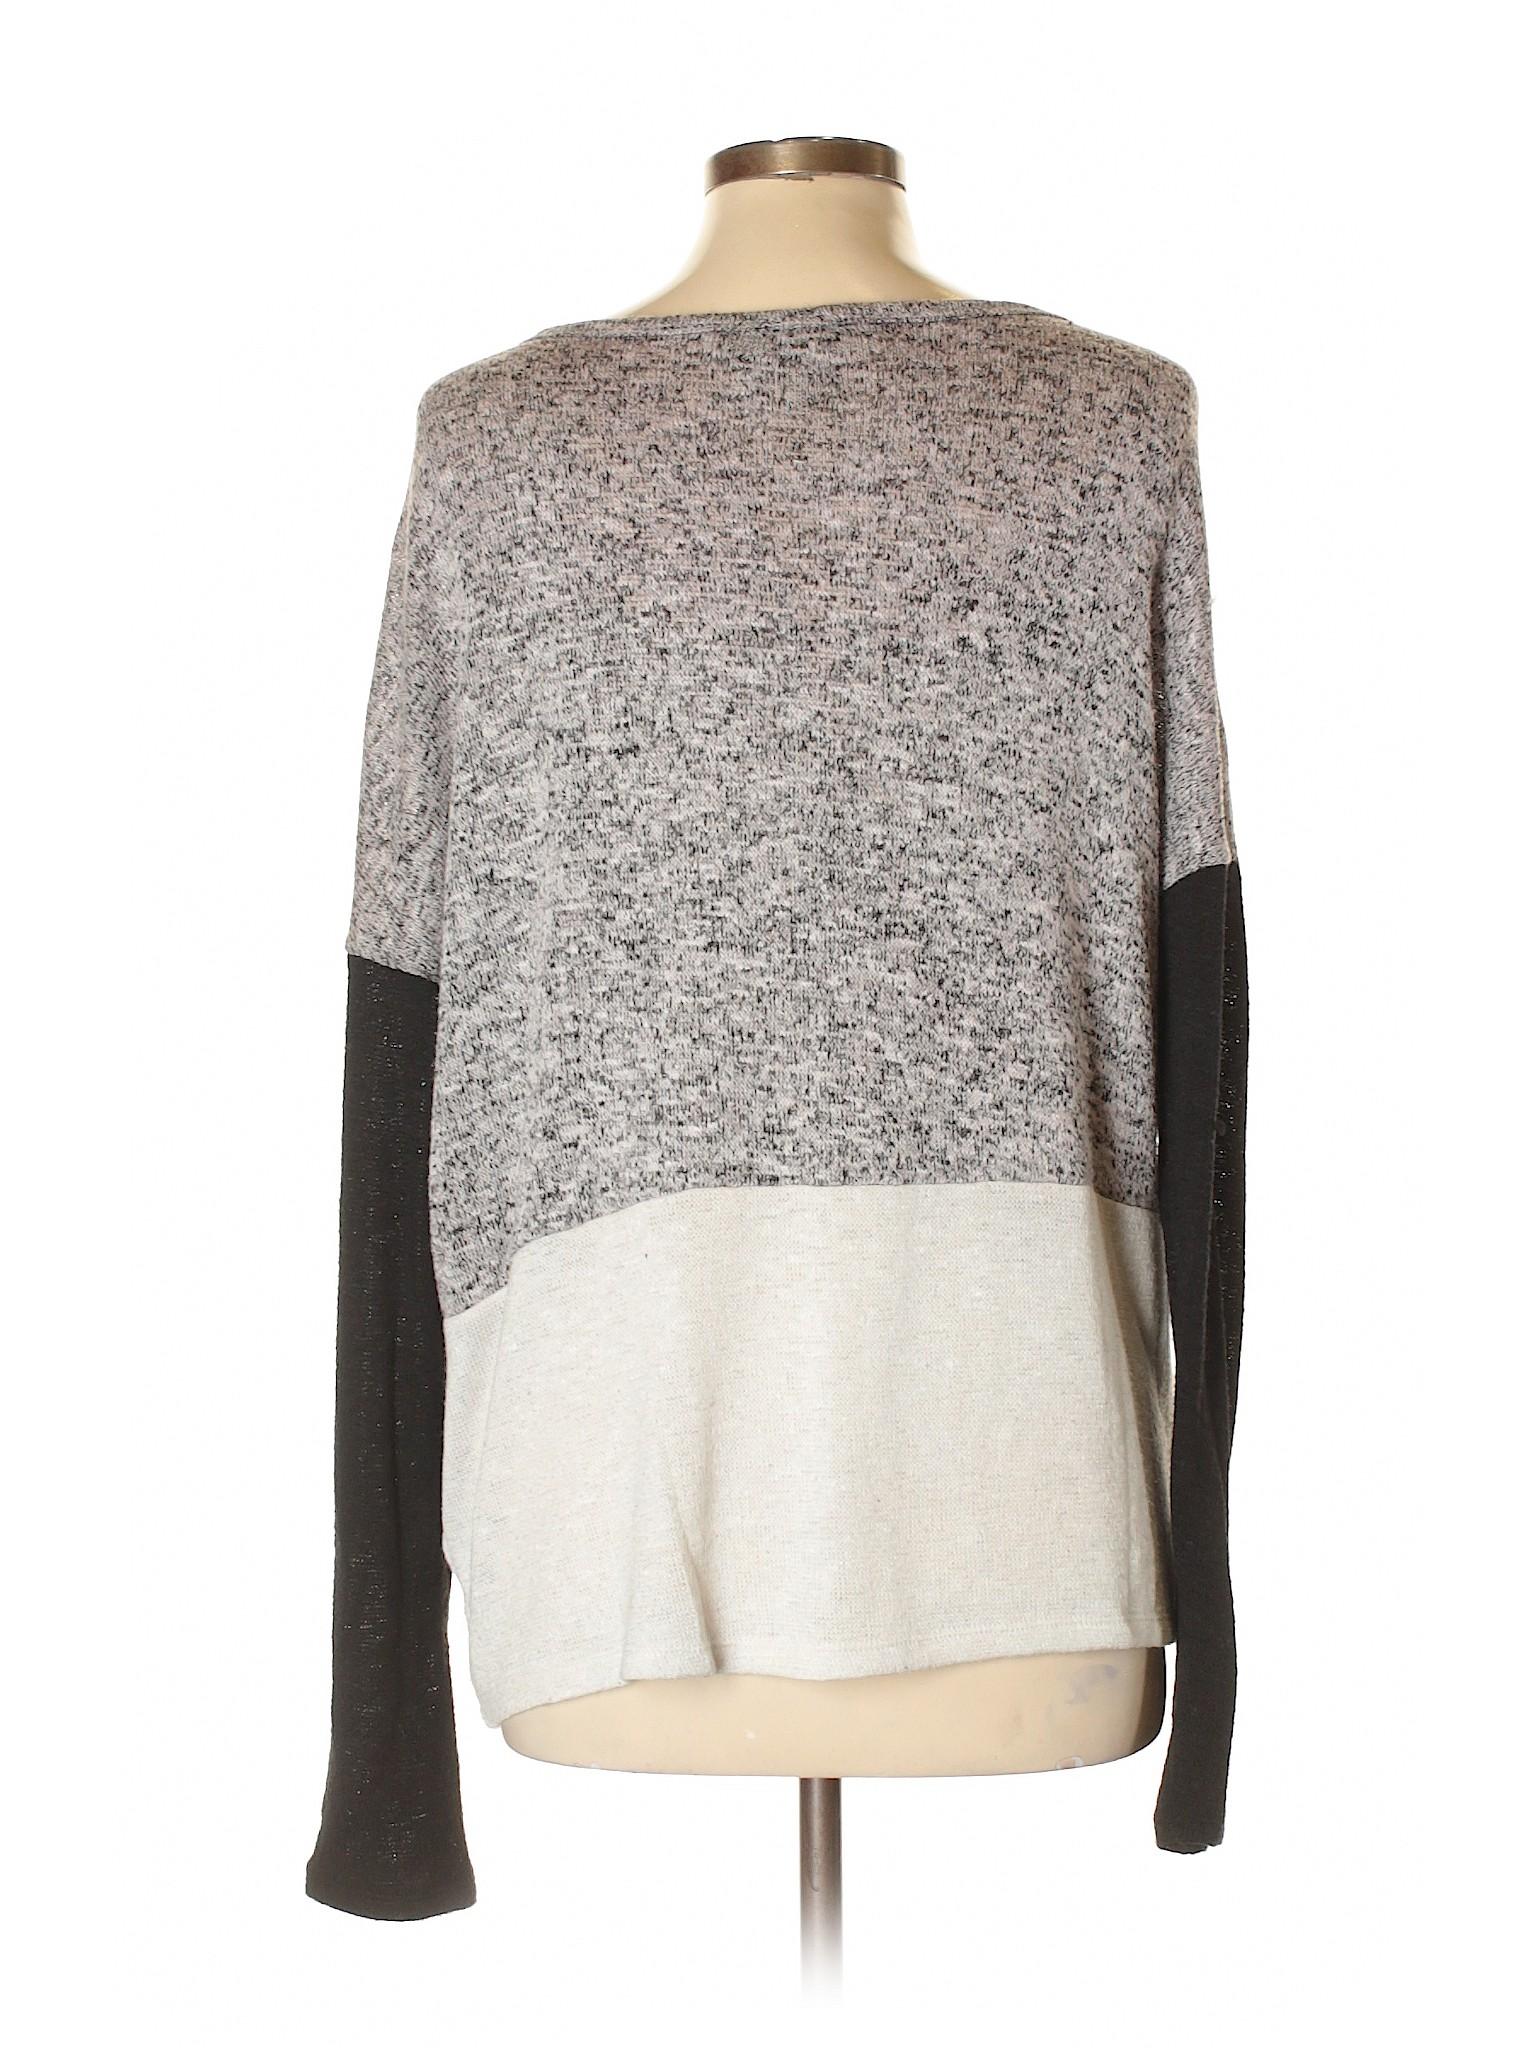 Boutique Boutique Charming Charlie Charlie Boutique Pullover Sweater Pullover Charming Sweater EHXqwHdZ